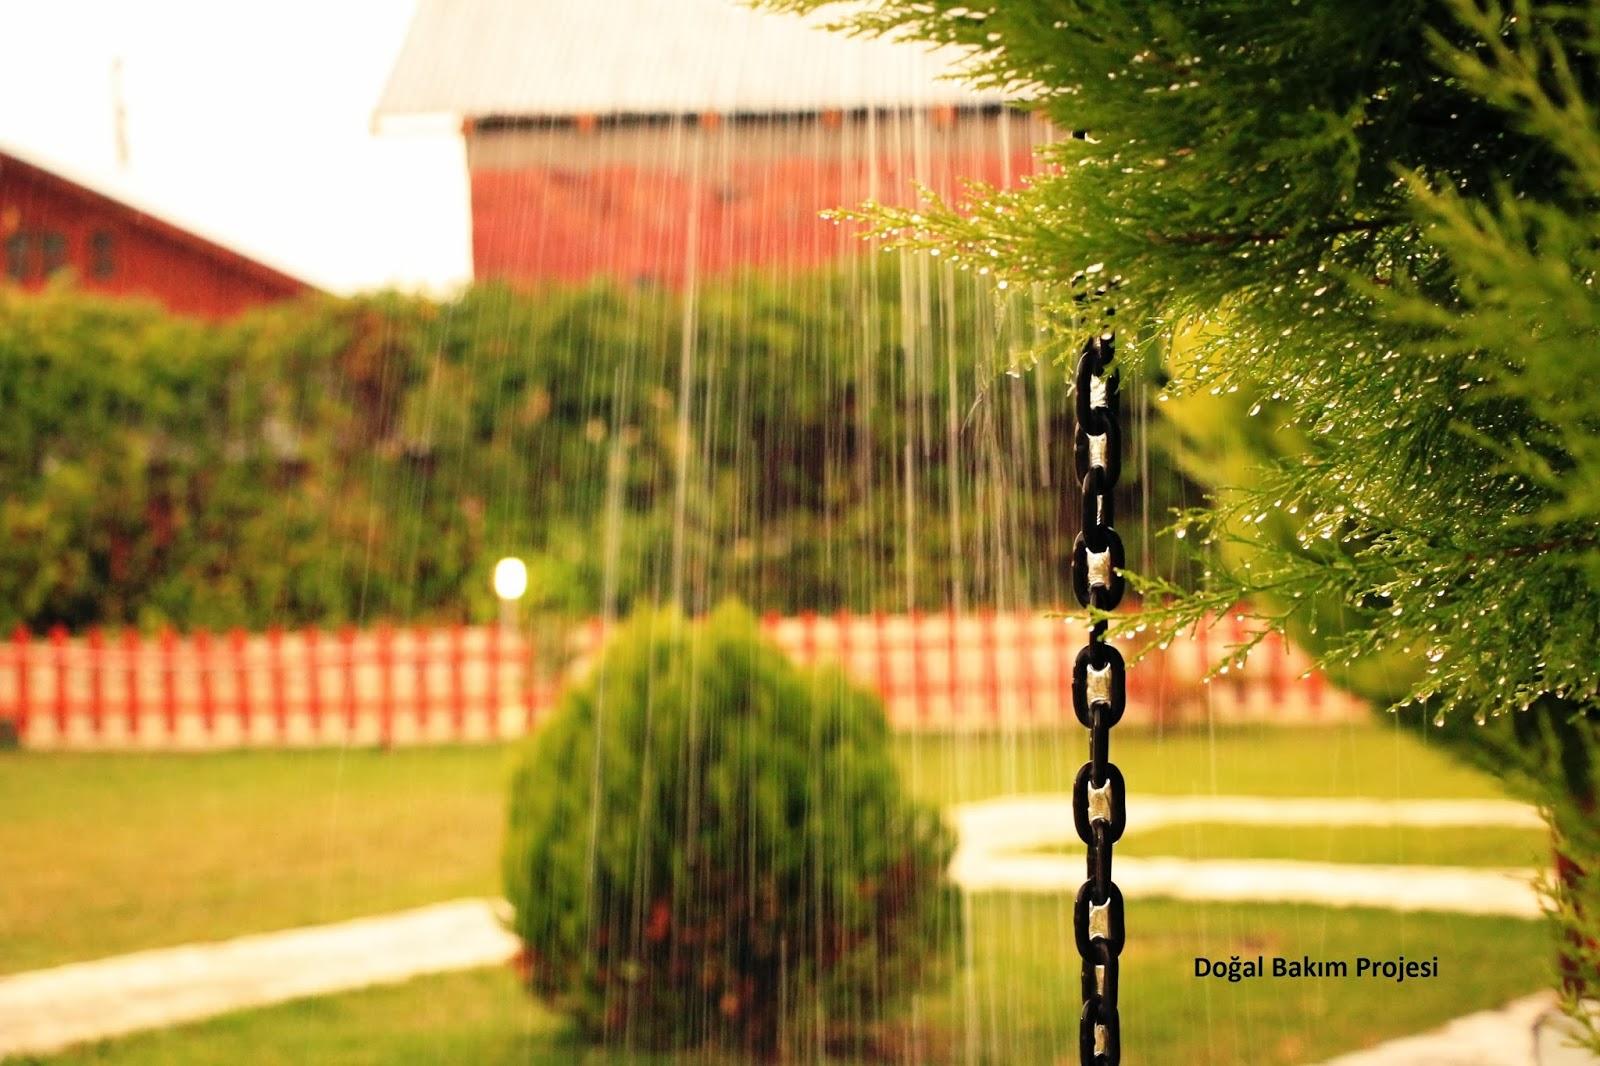 http://sagliklidogalkozmetik.blogspot.com.tr/2014/02/dort-temel-hint-kural-ile-depresyonla.html